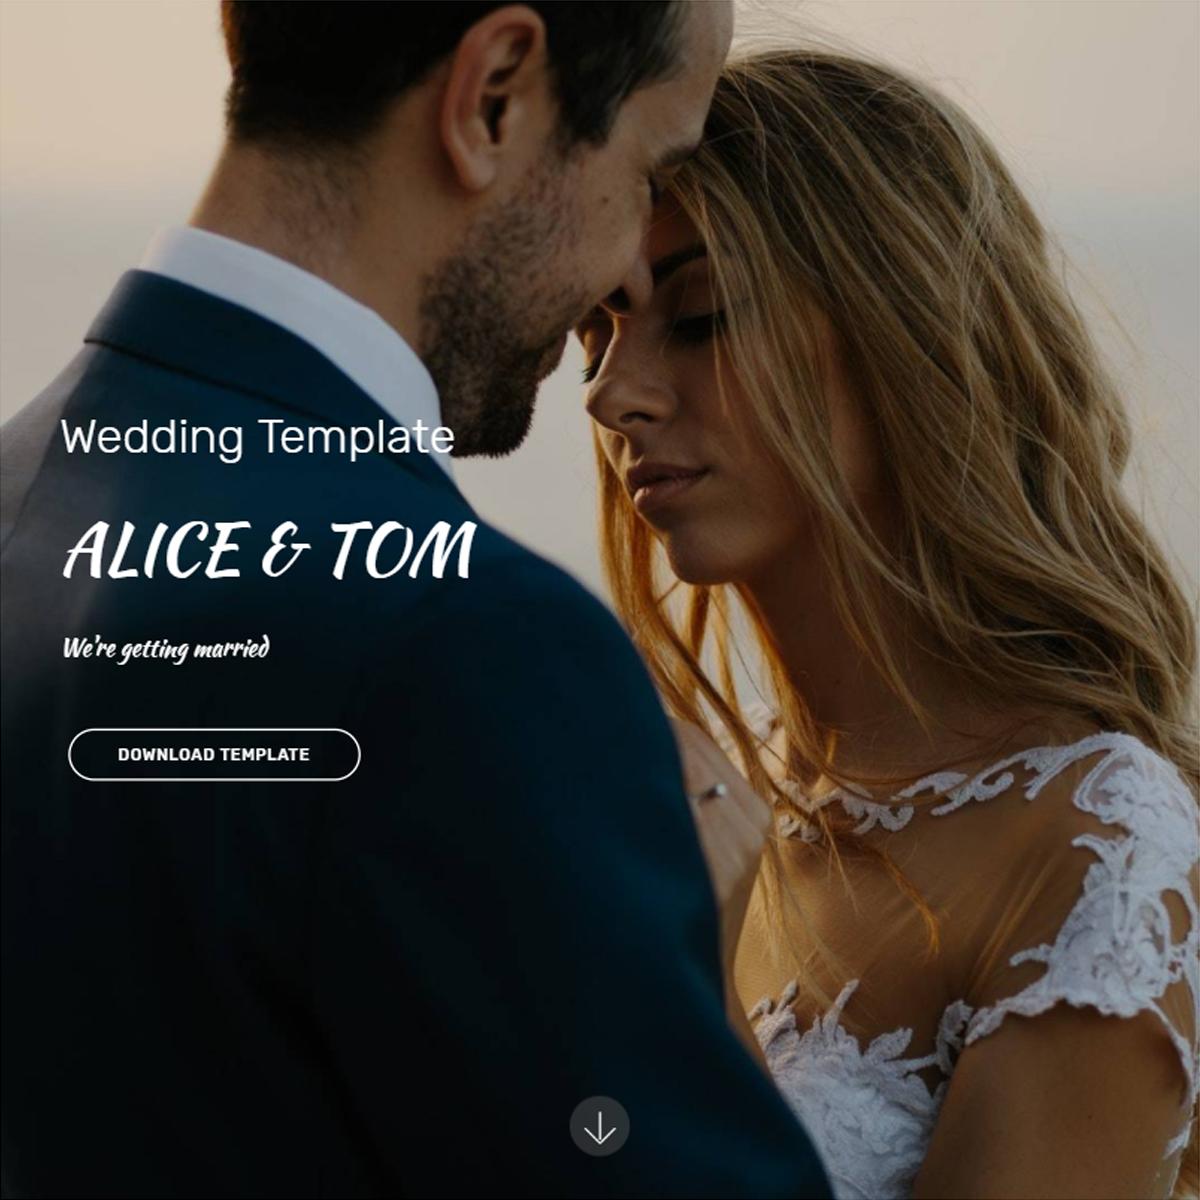 HTML Bootstrap Wedding Templates